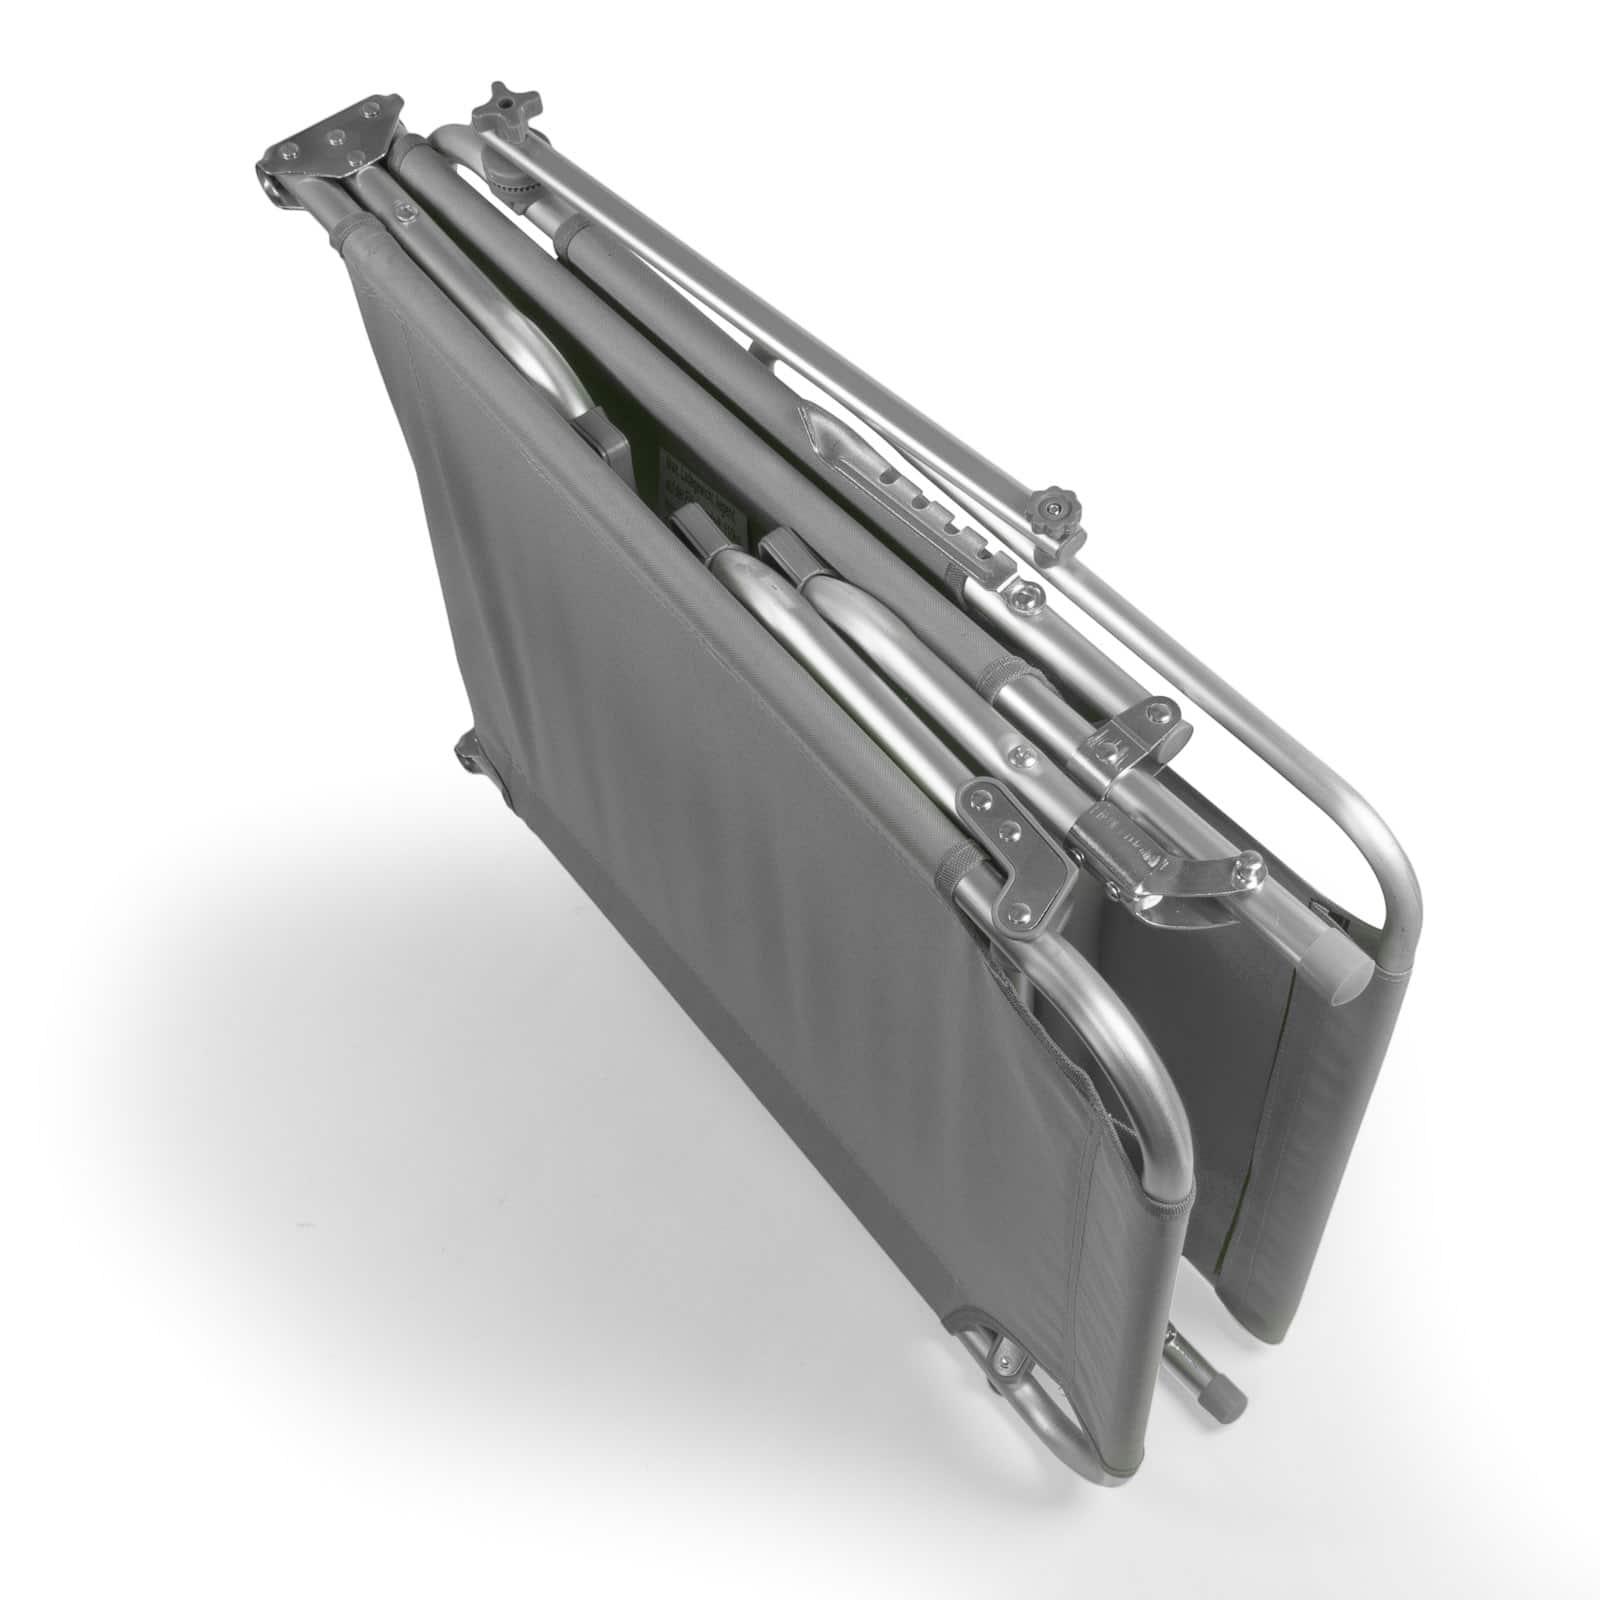 Comfortabel Aluminium Ligbed met Zonnendak 190x57 cm - Grijs